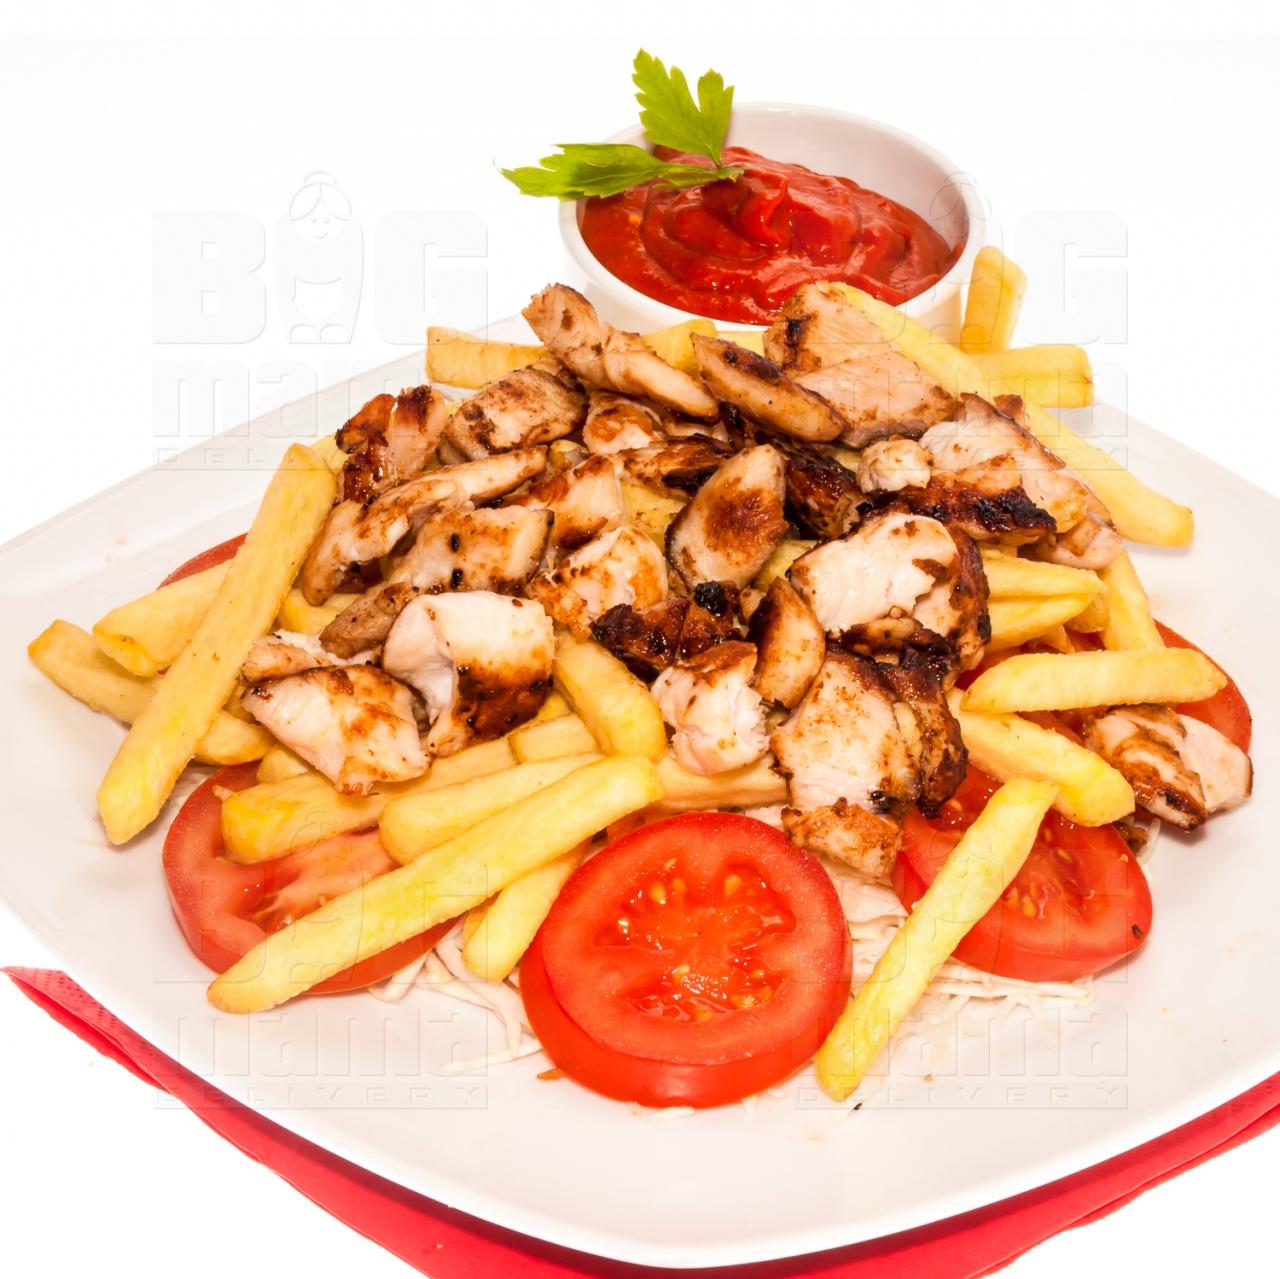 Product #142 image - Kebab mic cu sos